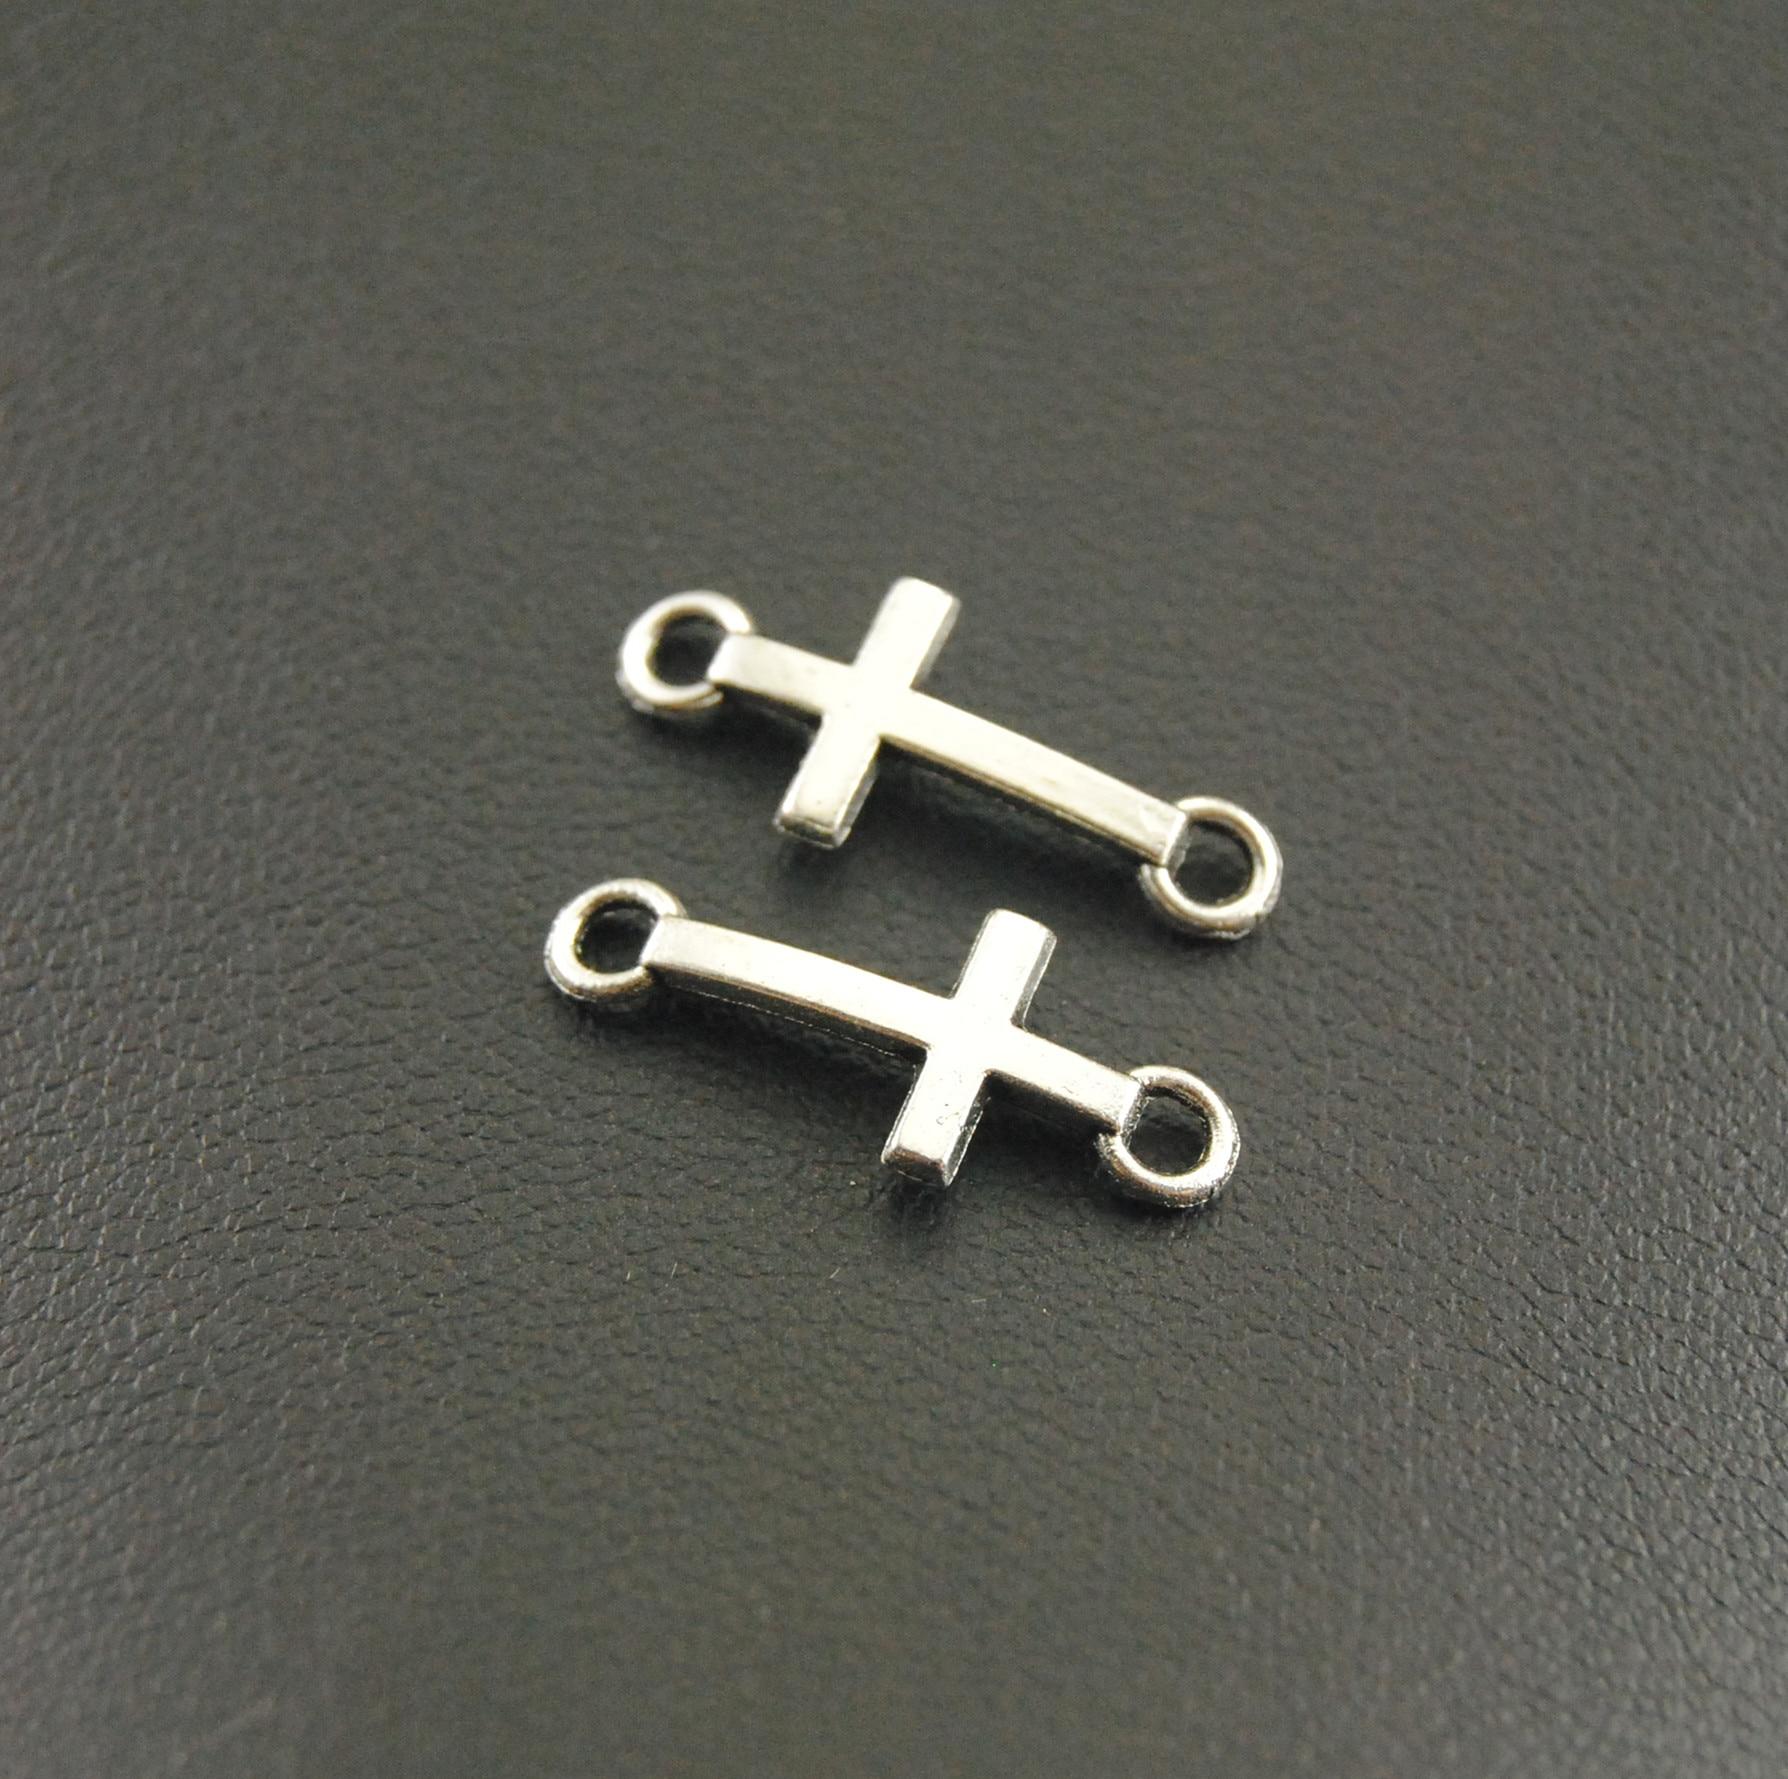 15 Pcs 8x20mm Cross Charms,Antique Silver Sideways Mini Cross Charm Handmade Charms Pendants Jewelry Findings A1165